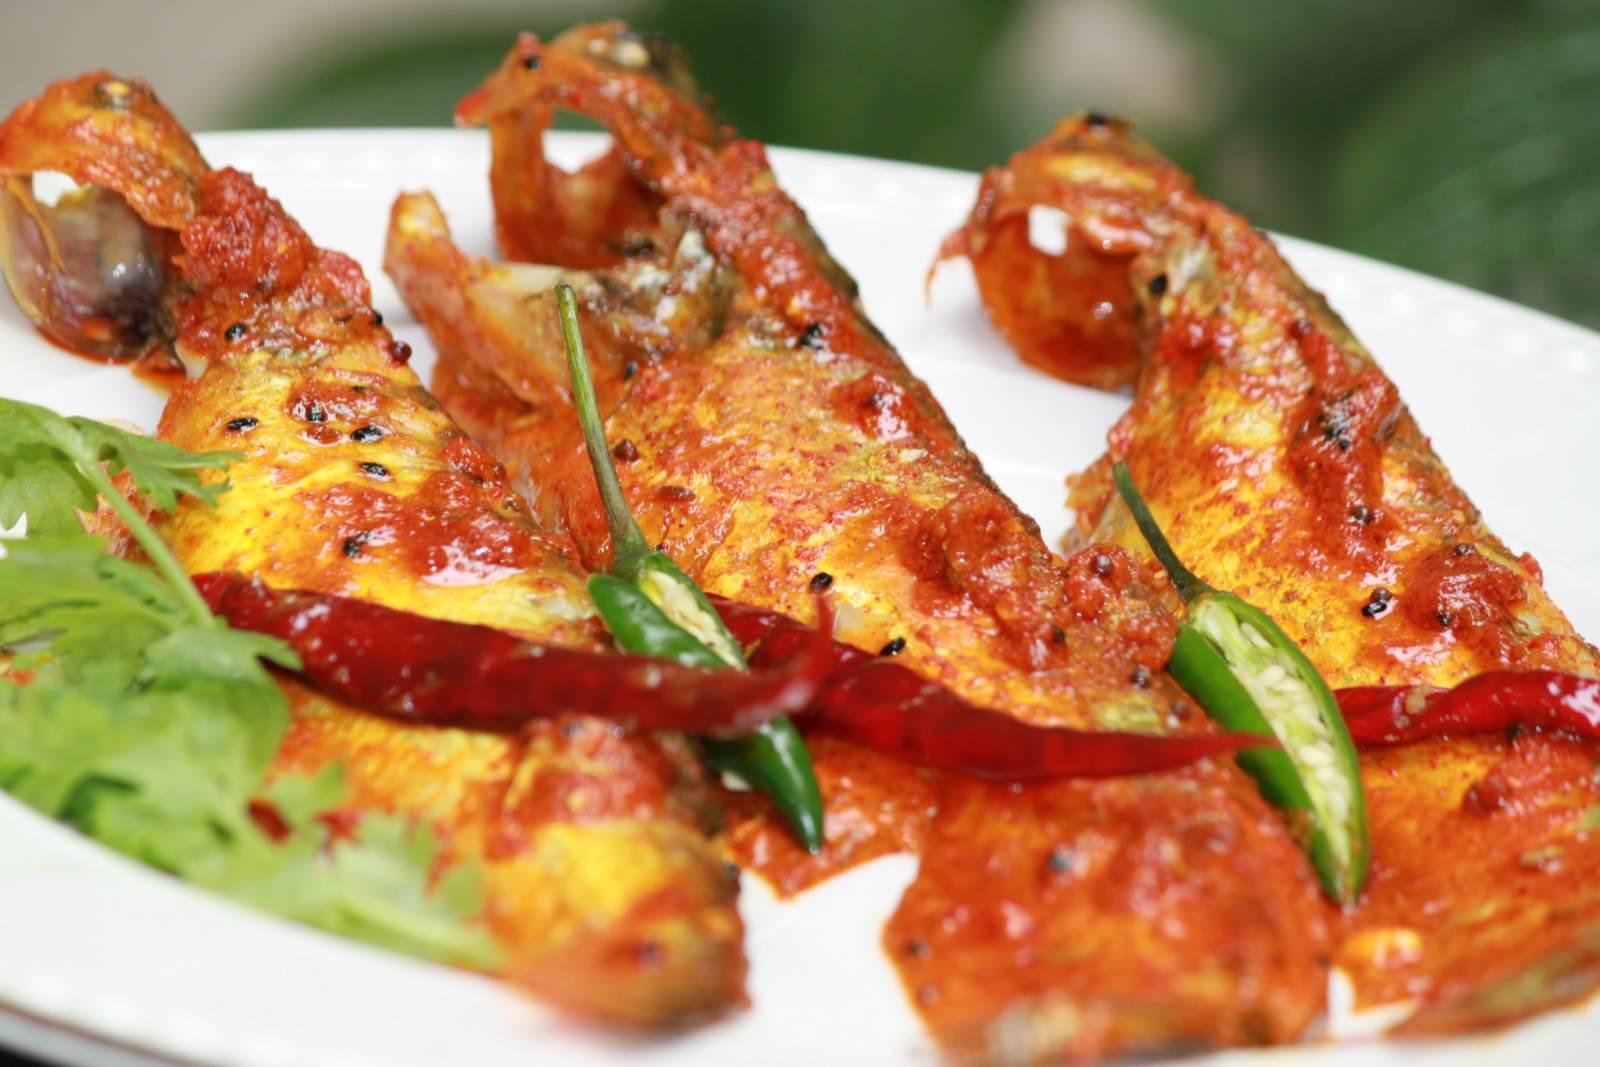 Creamy indian butter fish recipe creamy pabda fish by archanas creamy indian butter fish recipe creamy pabda fish forumfinder Images